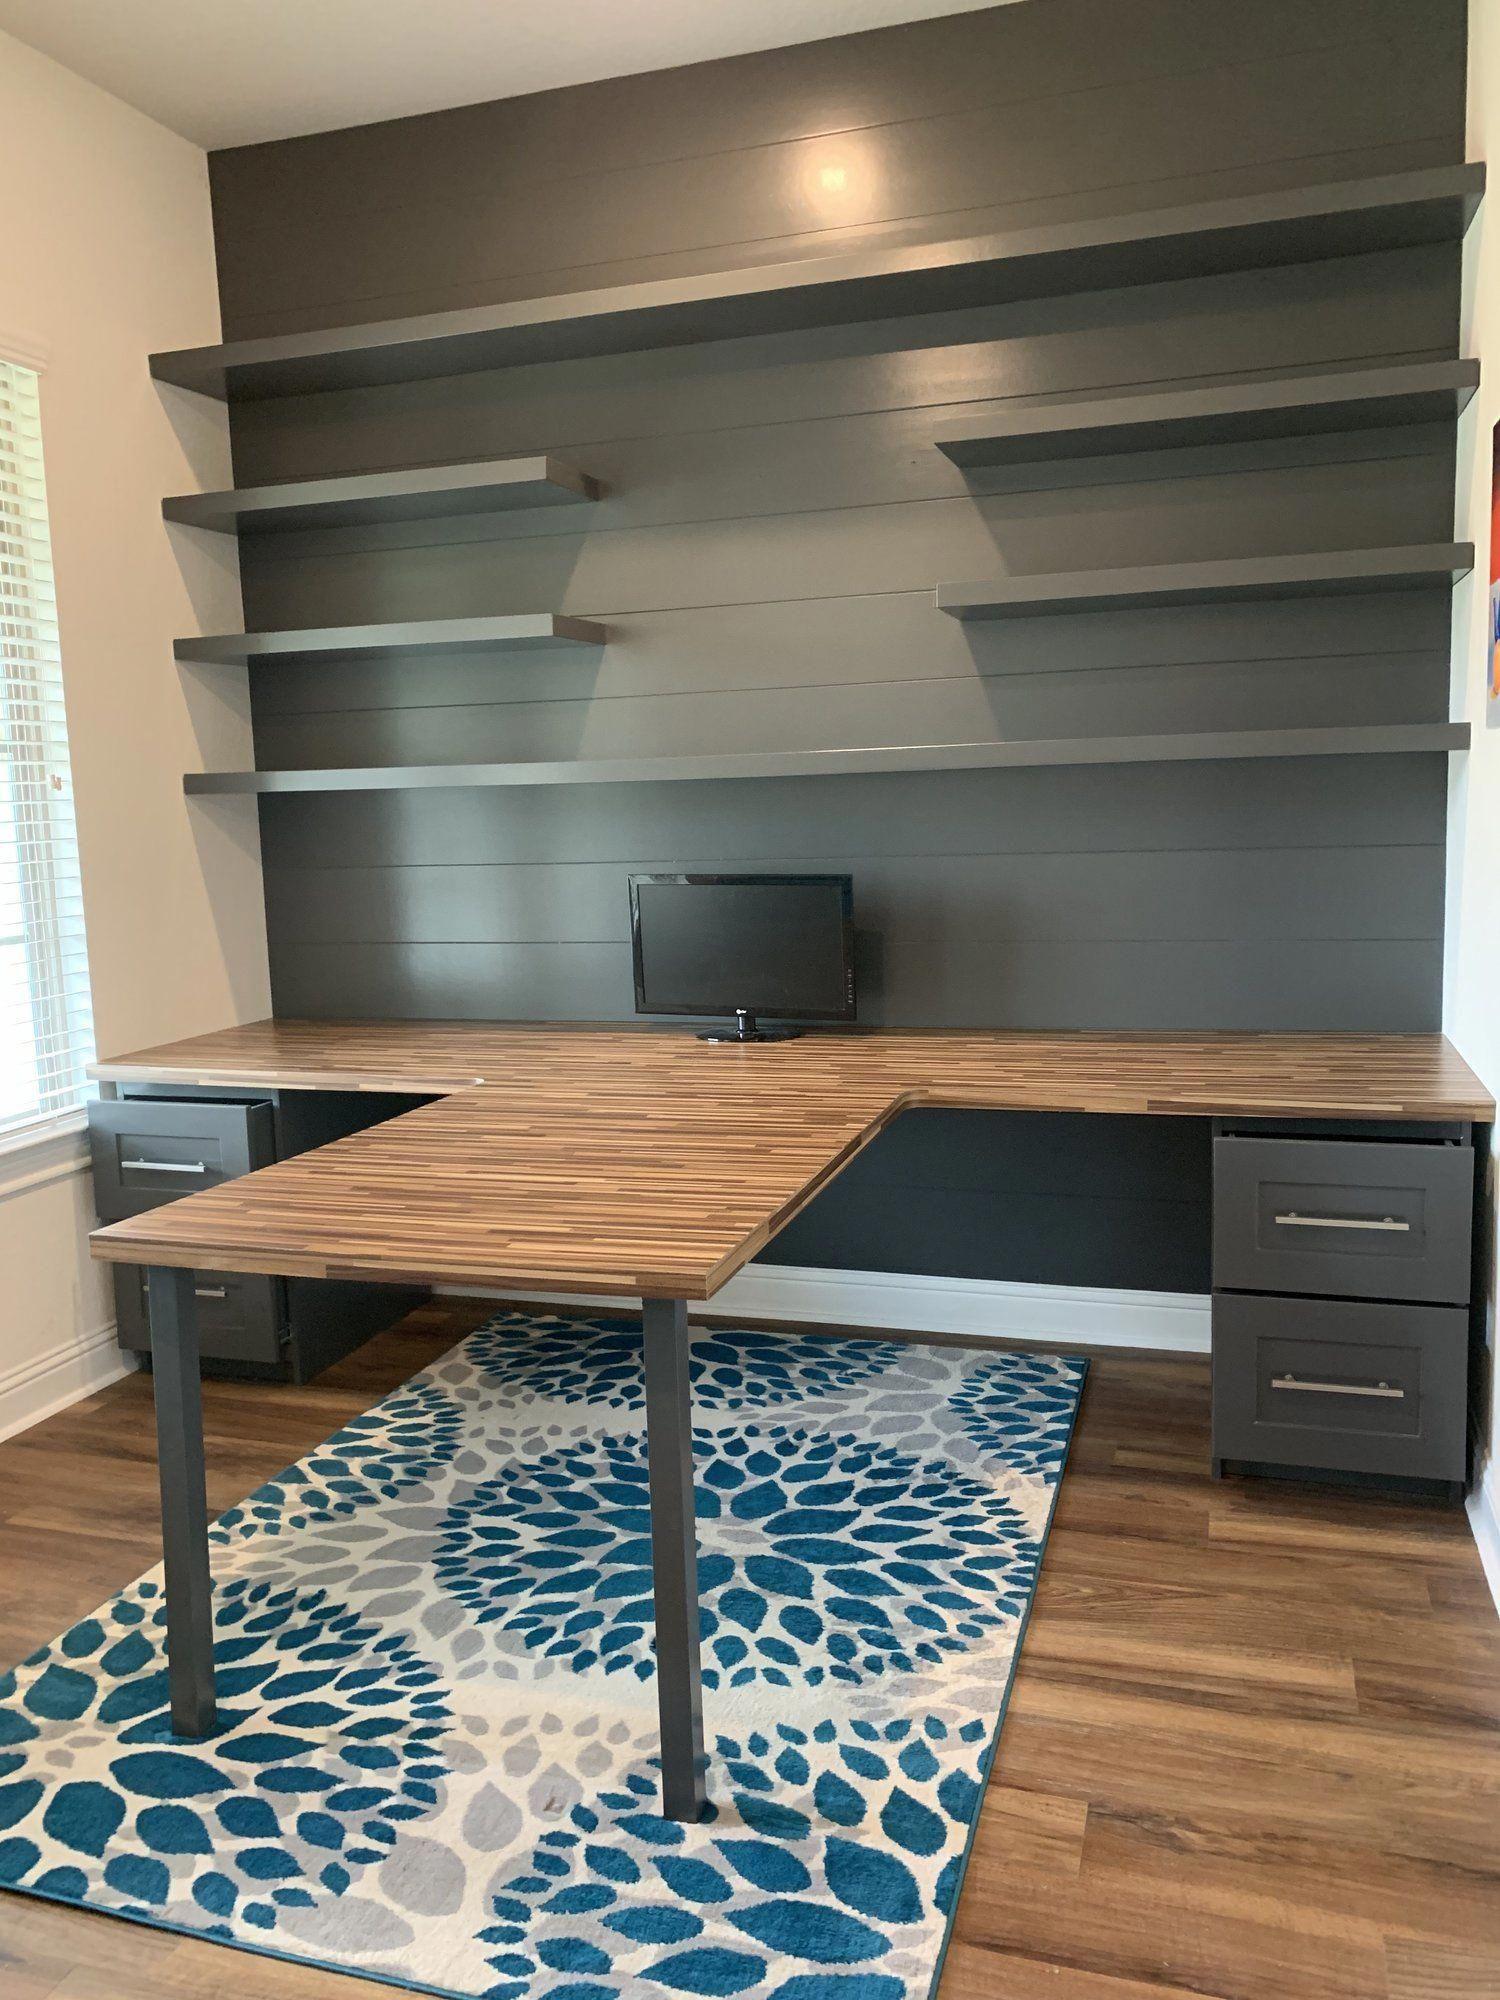 The Office T Shaped Desk Roomremodelideas In 2020 Home Office Decor Home Office Design Craft Room Office